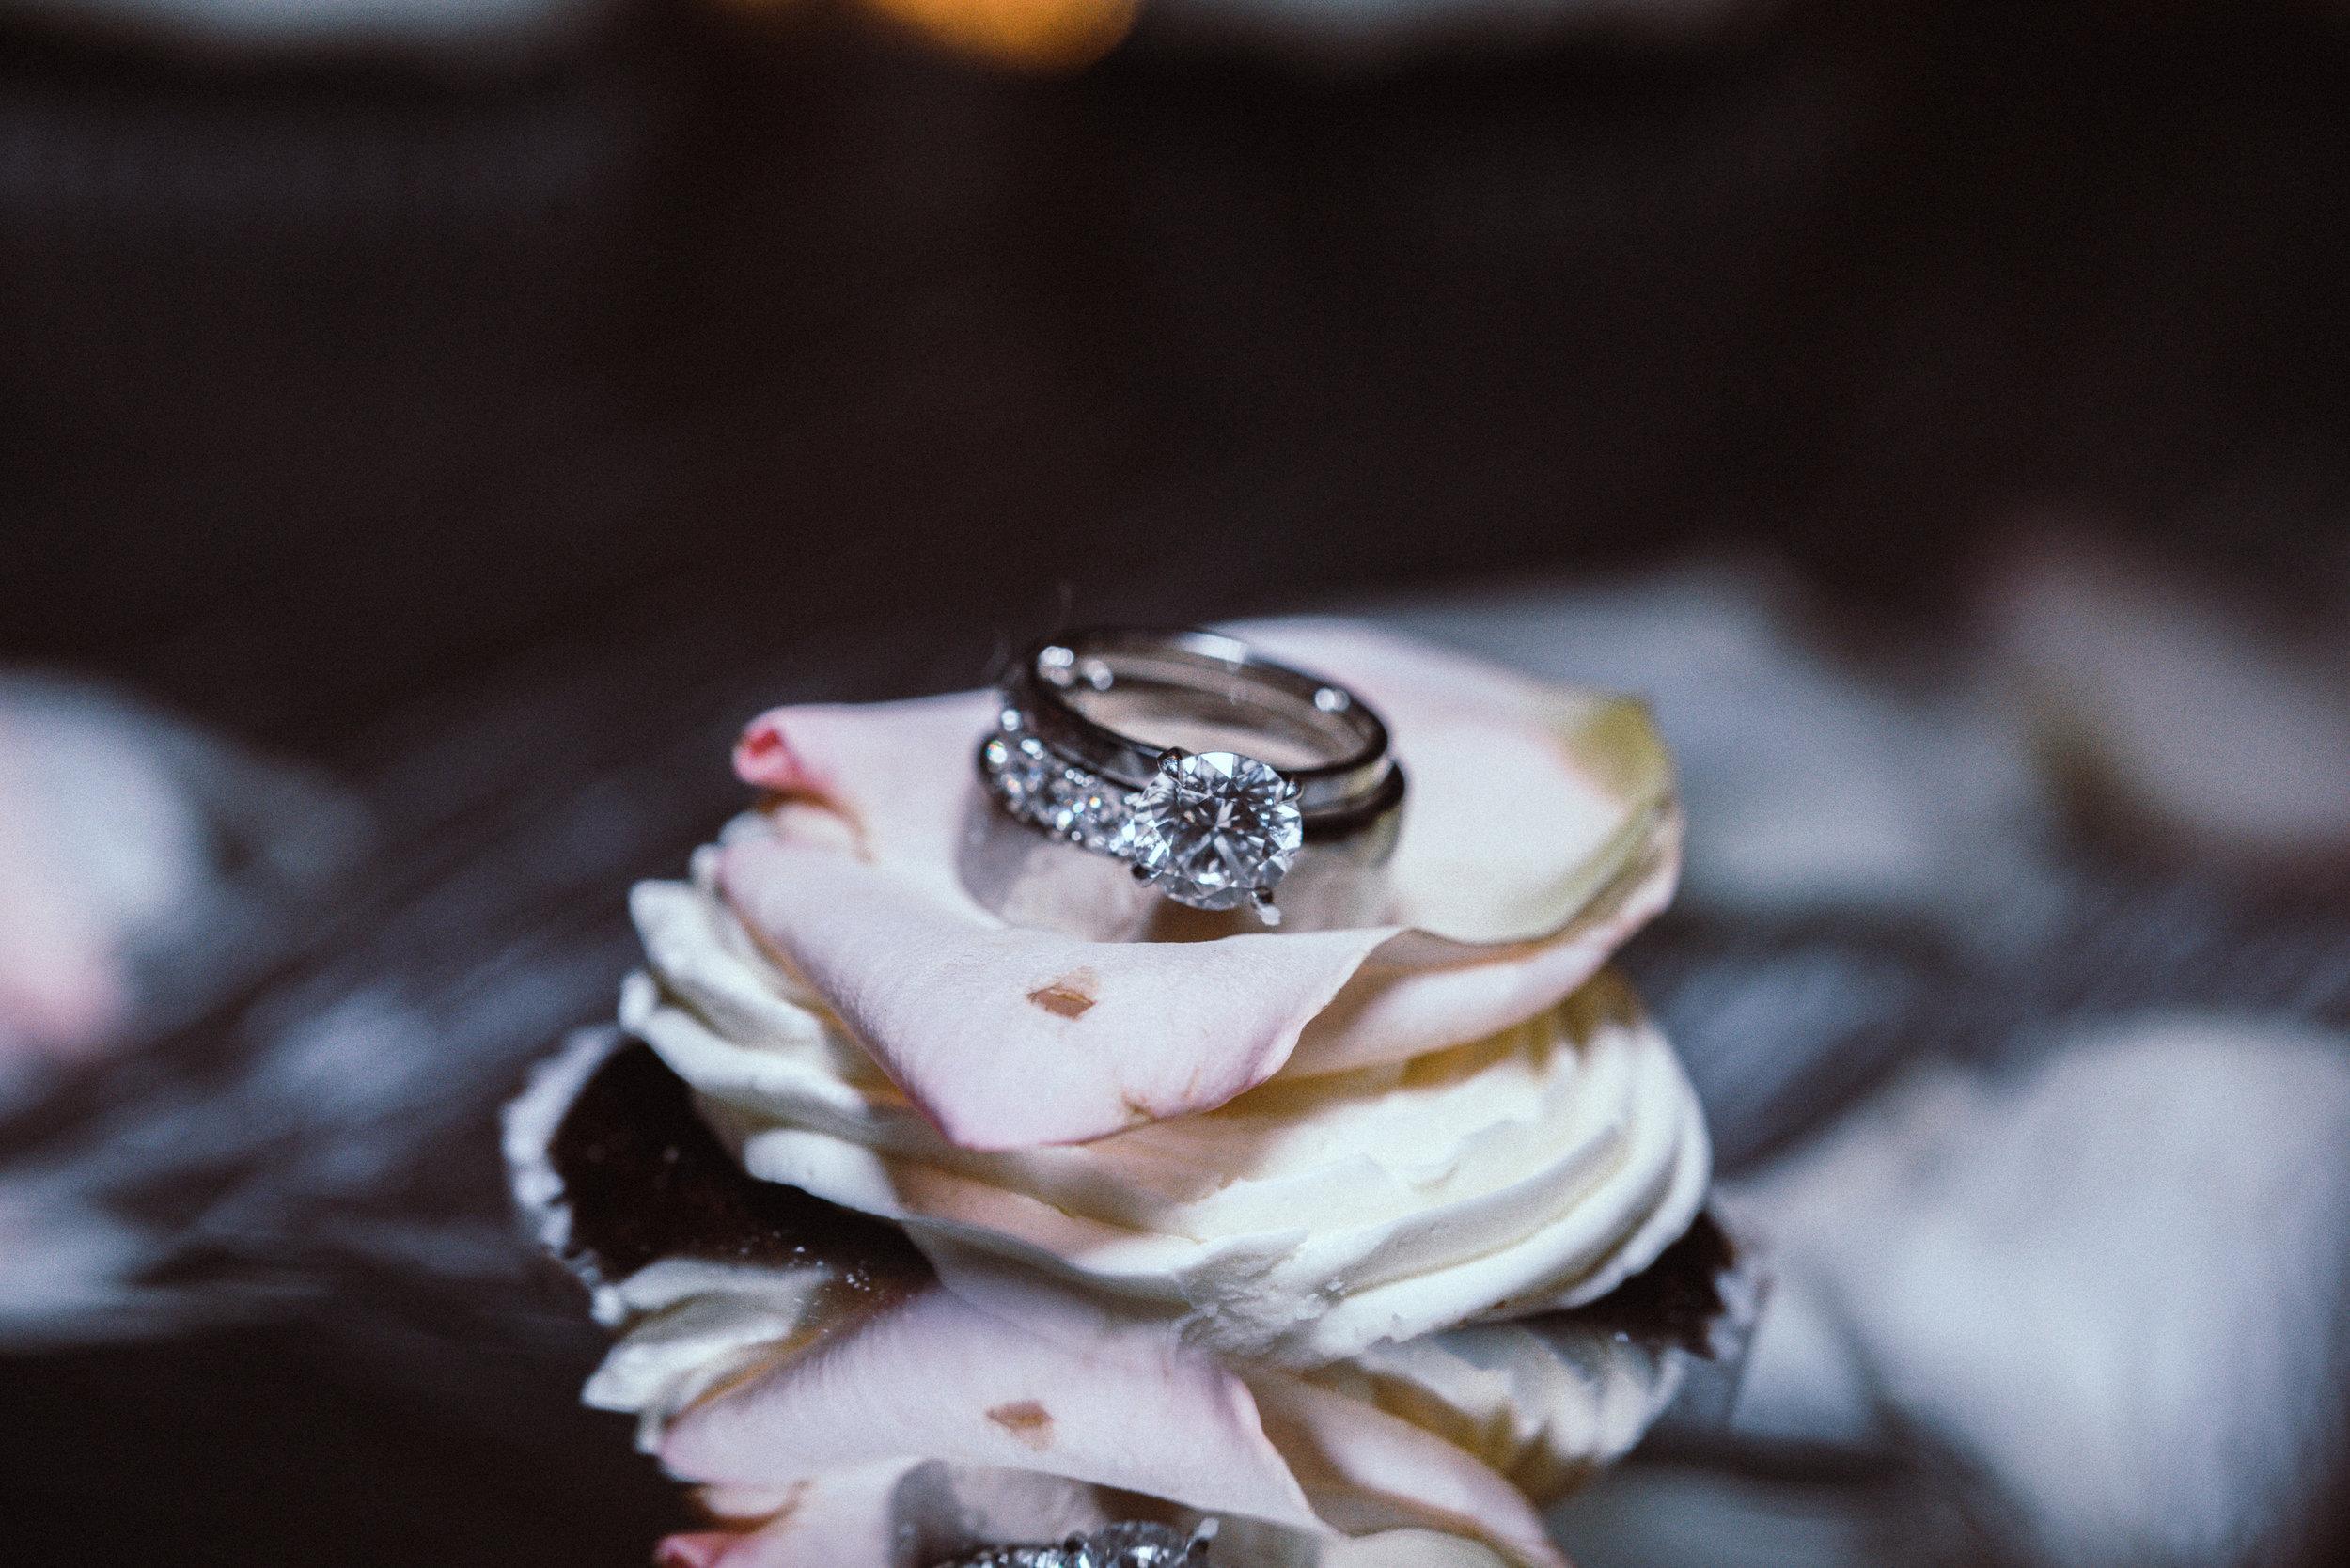 St.Pete wedding photographer, St.Pete wedding, Tampa wedding photographer